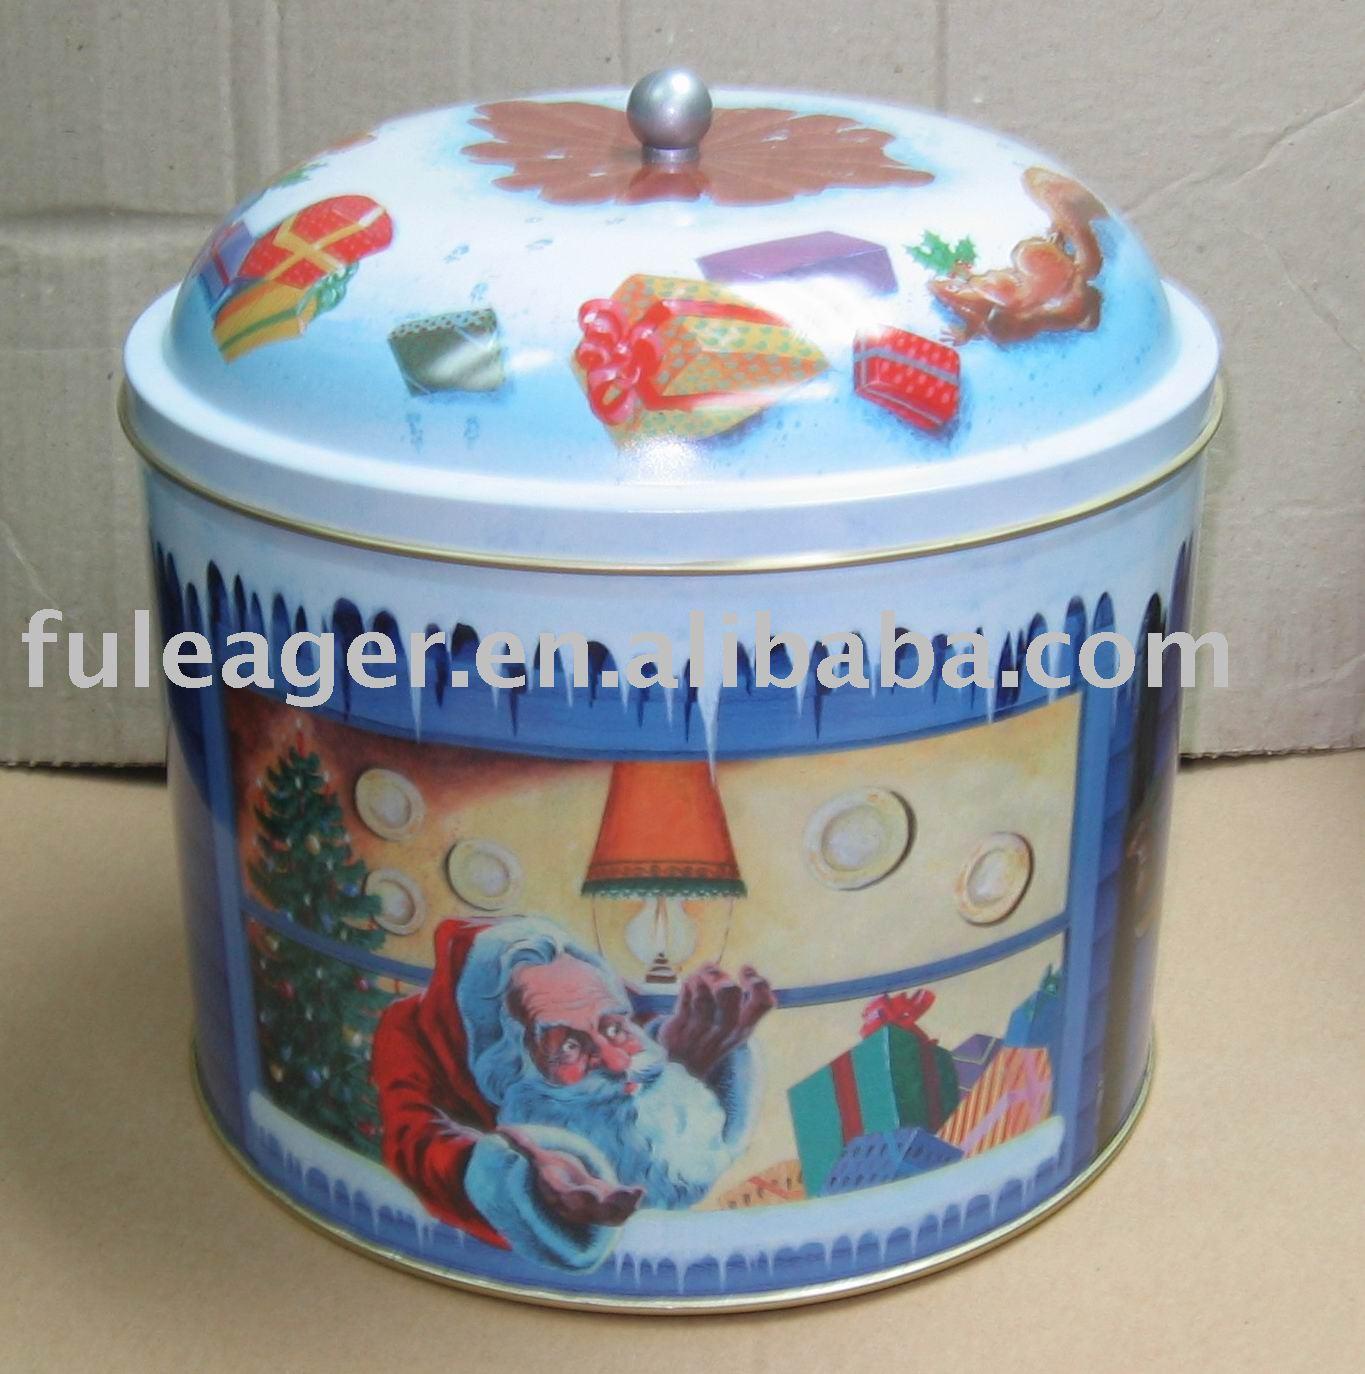 Christmas Cookie Tin Box,Biscuit Tin Case - Buy Tin Box,Tin Can ...